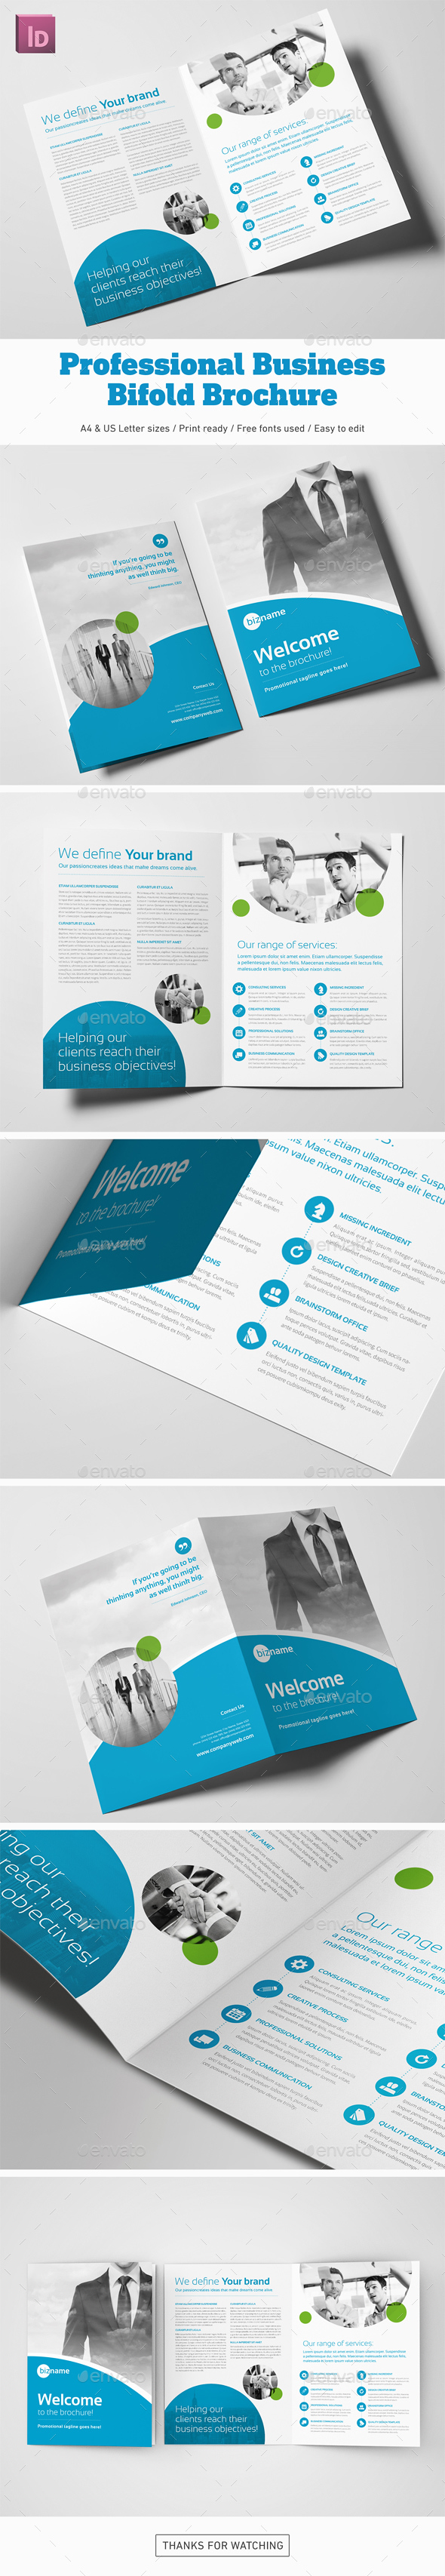 Professional Business Bifold Brochure - Corporate Brochures